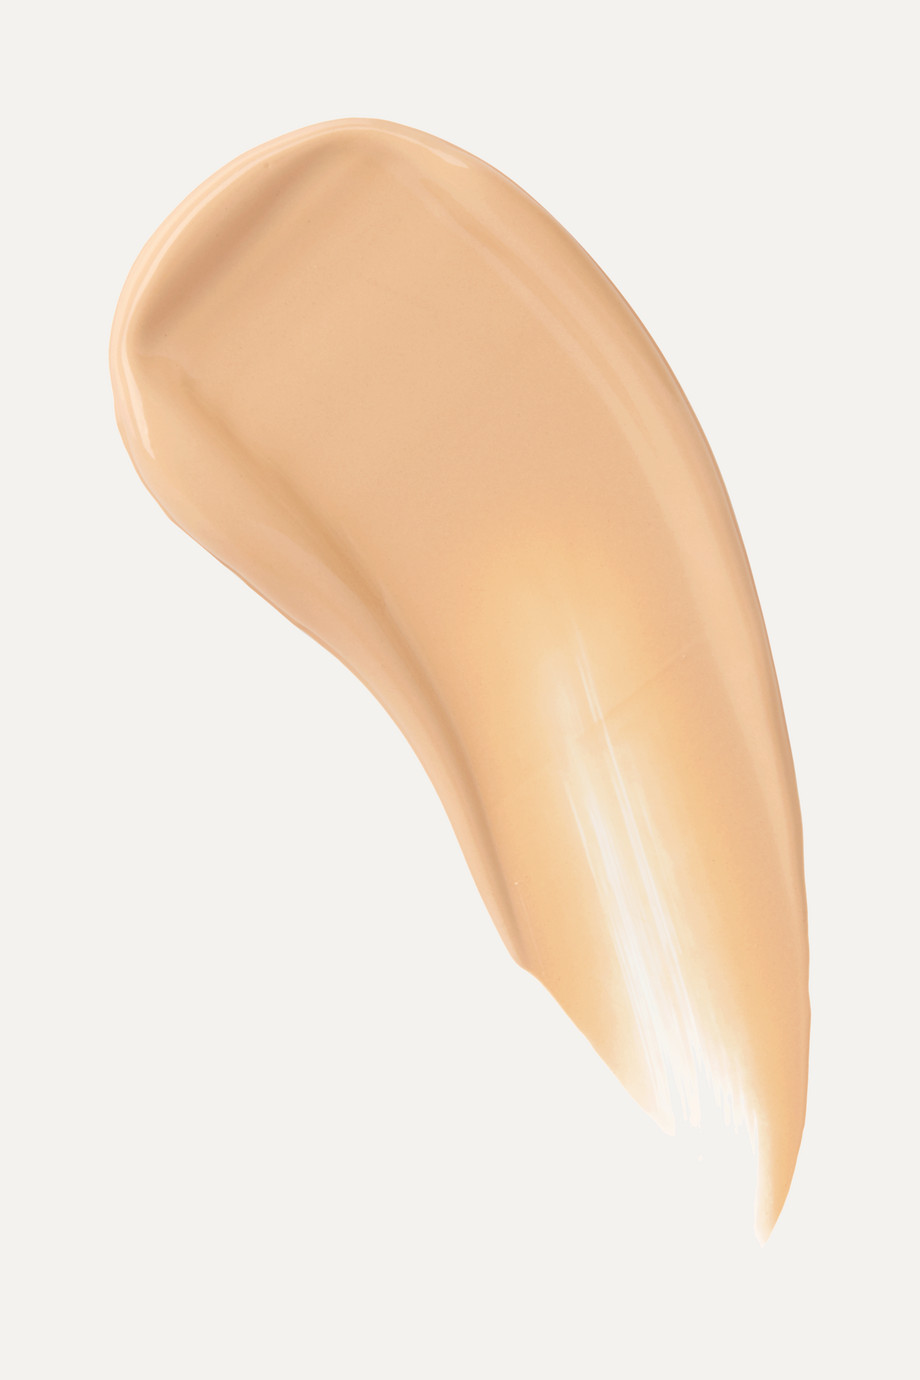 Charlotte Tilbury Magic Foundation Flawless Long-Lasting Coverage SPF15 - Shade 3.5, 30ml